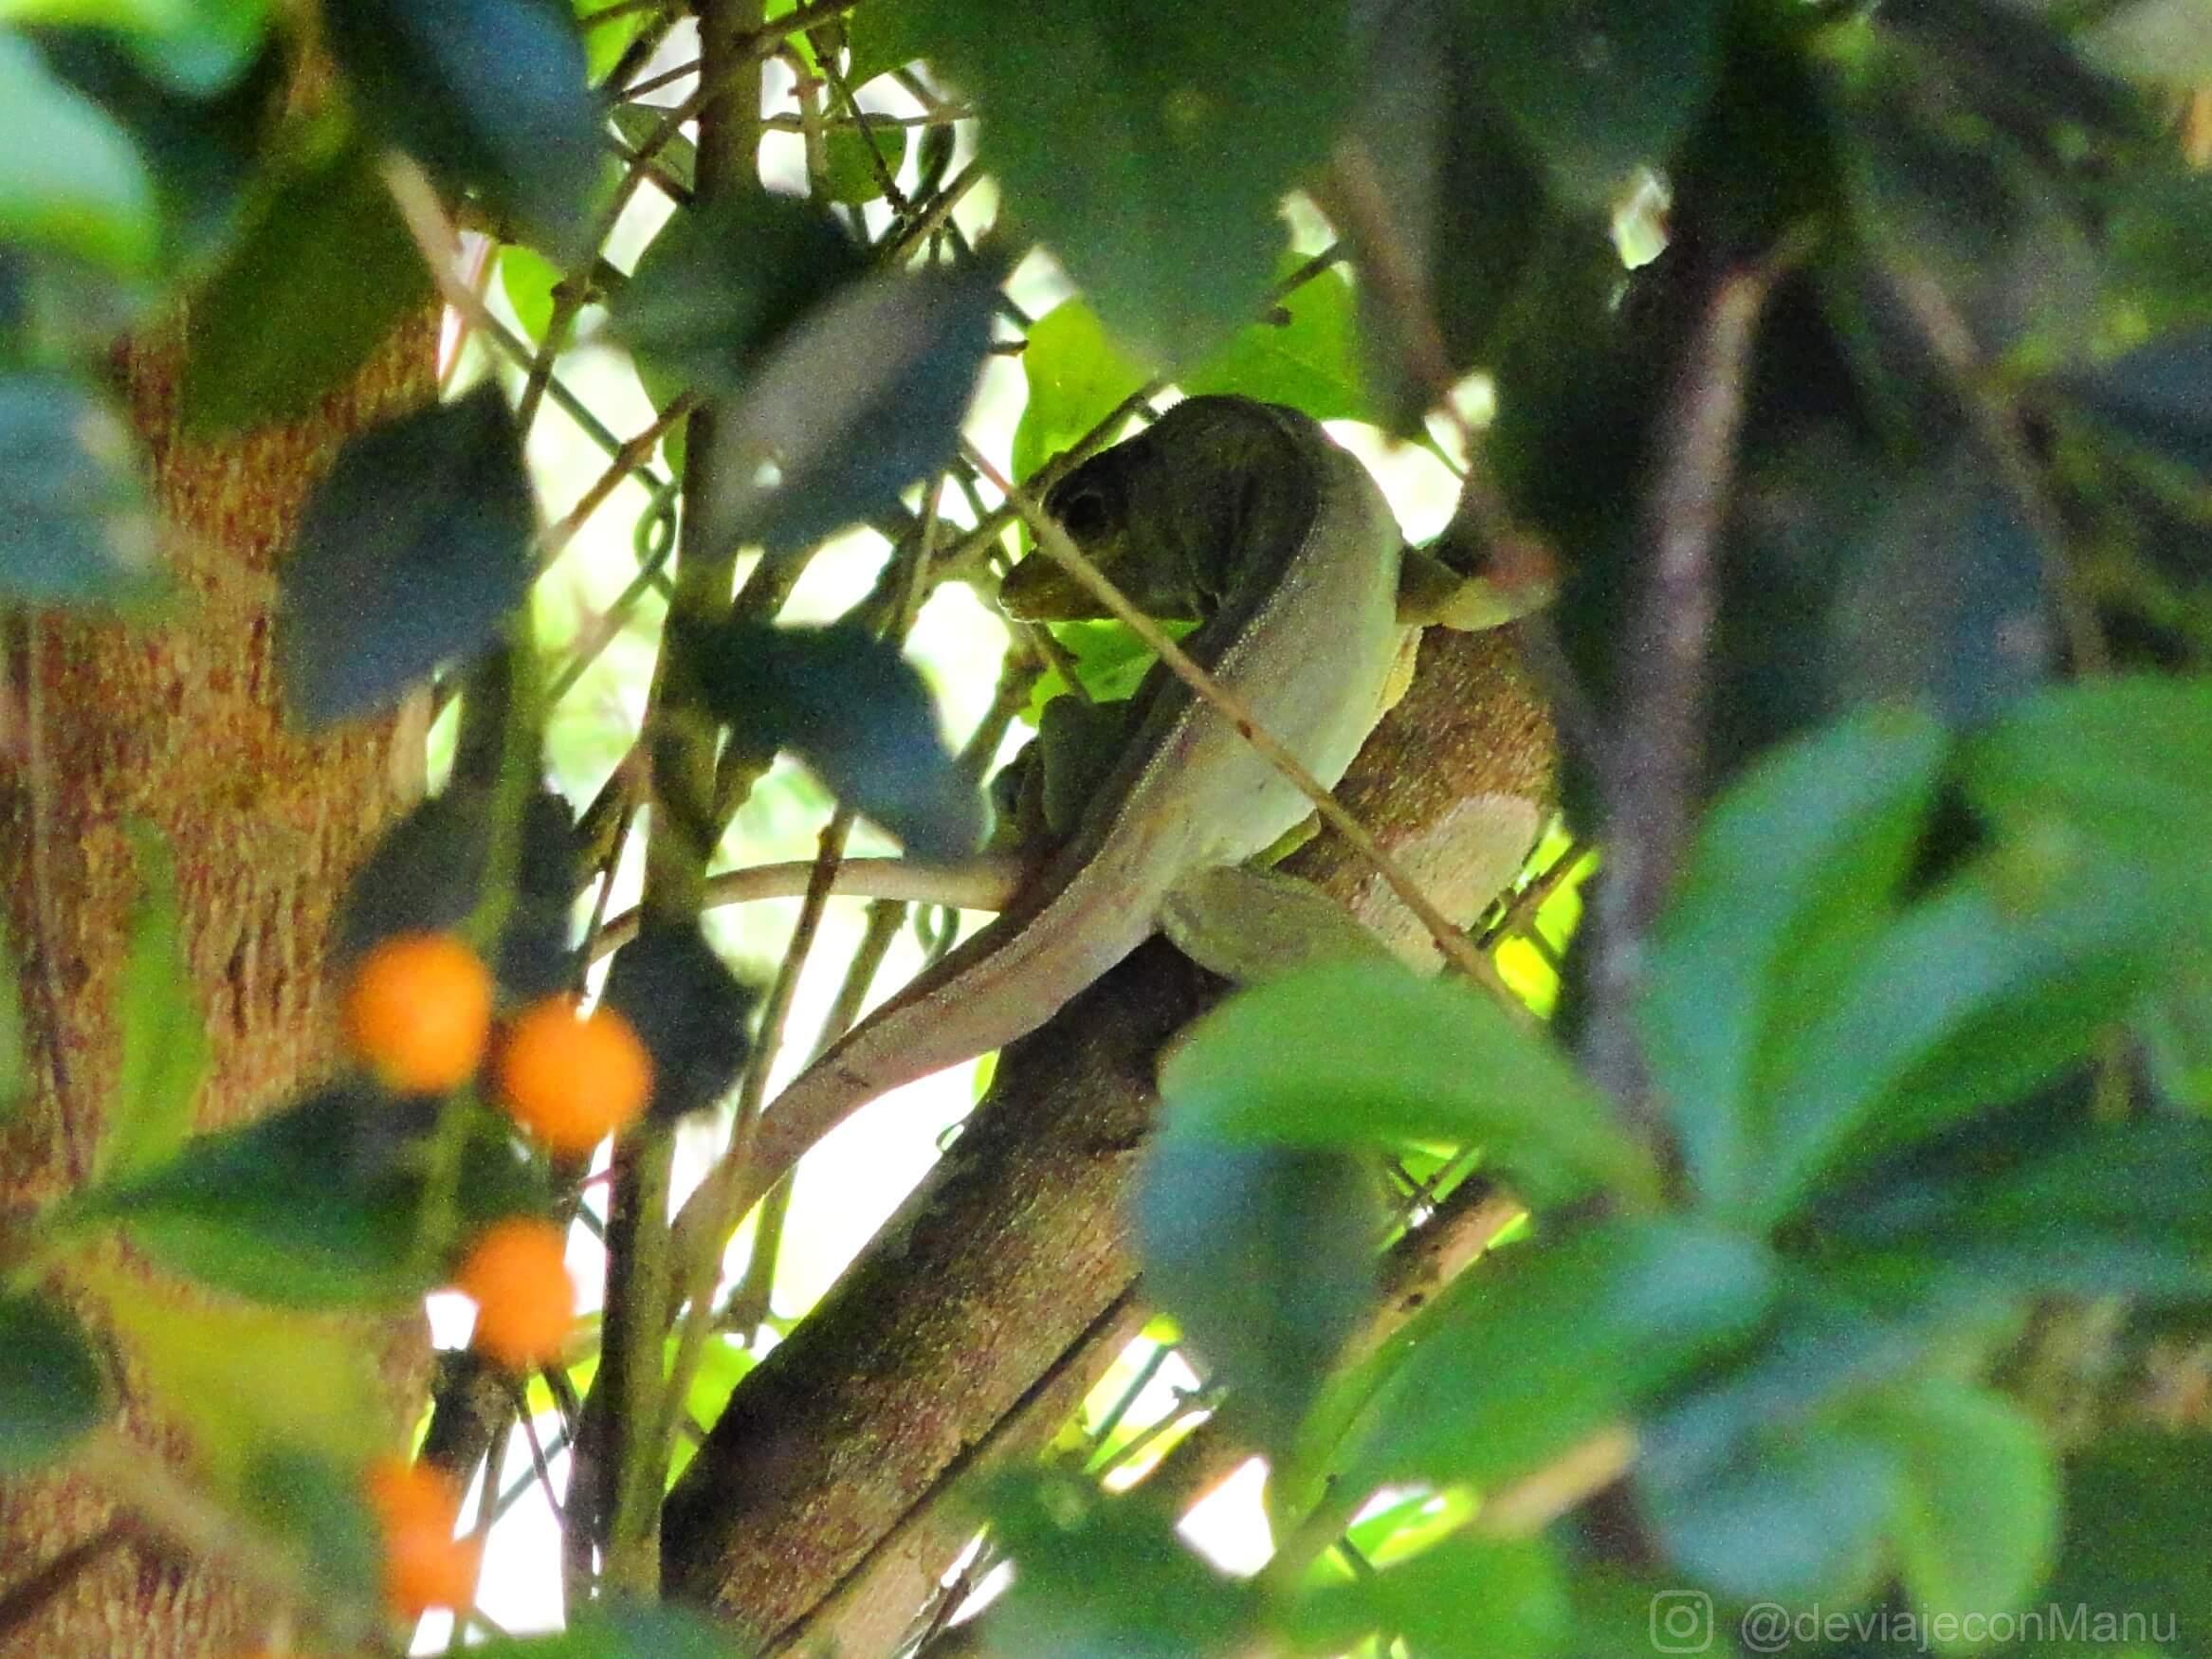 Reptil vigilante